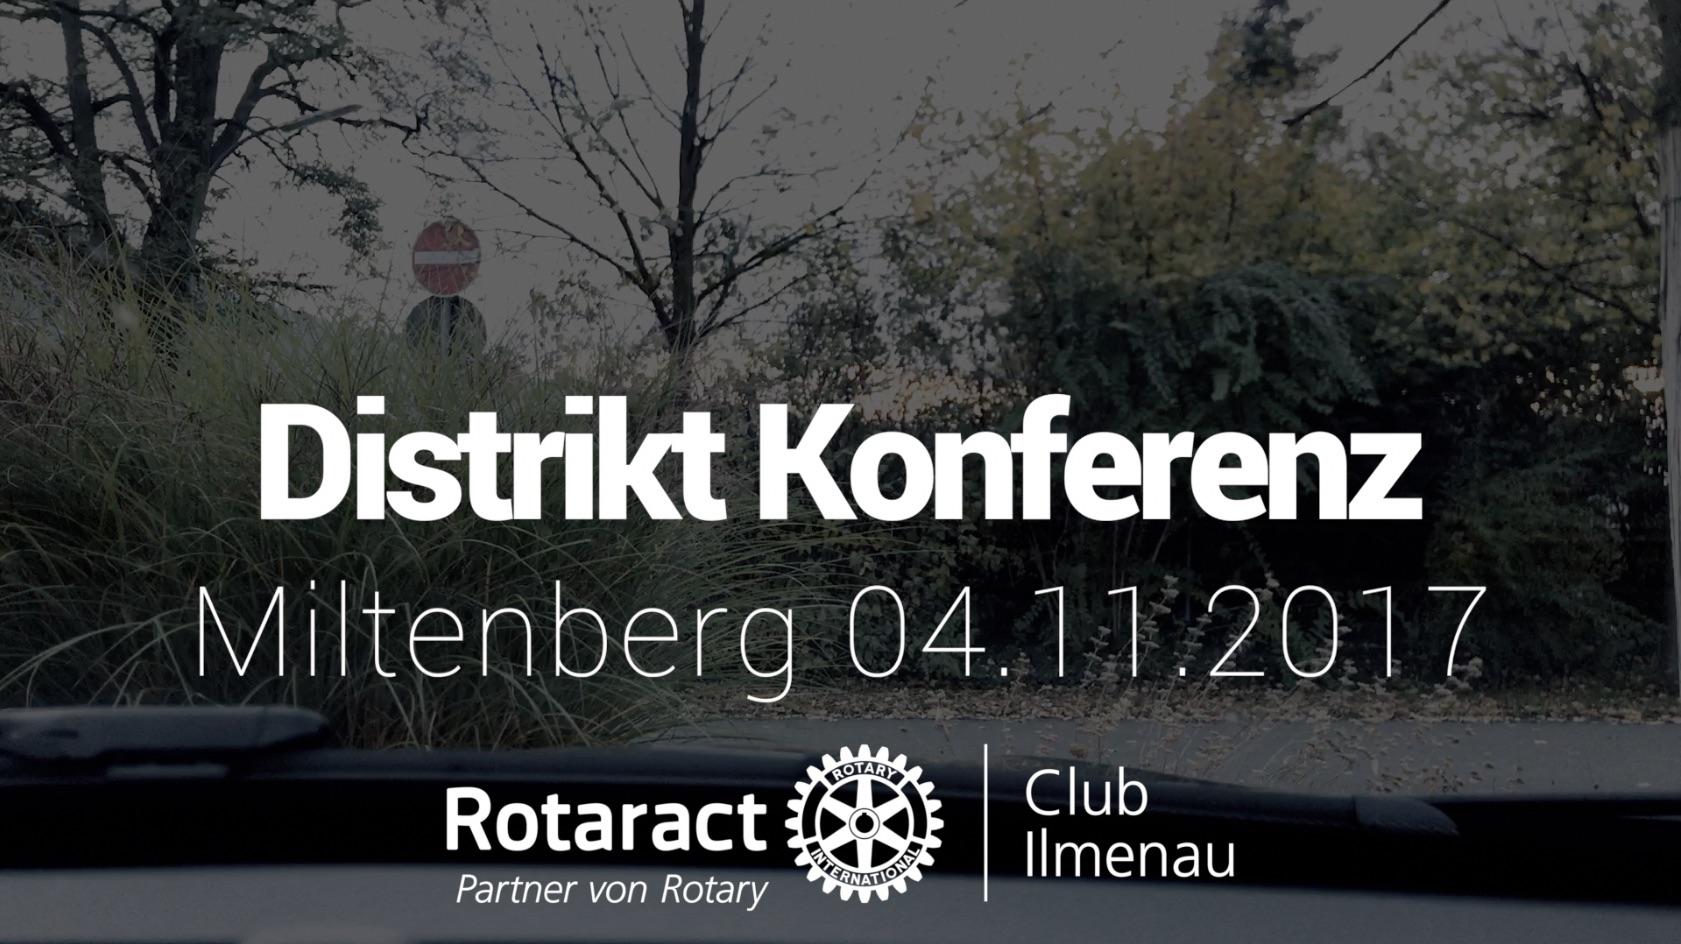 Rotaract Distriktkonferenz Miltenberg 2017 | District 1950 | Rotaract Club Ilmenau